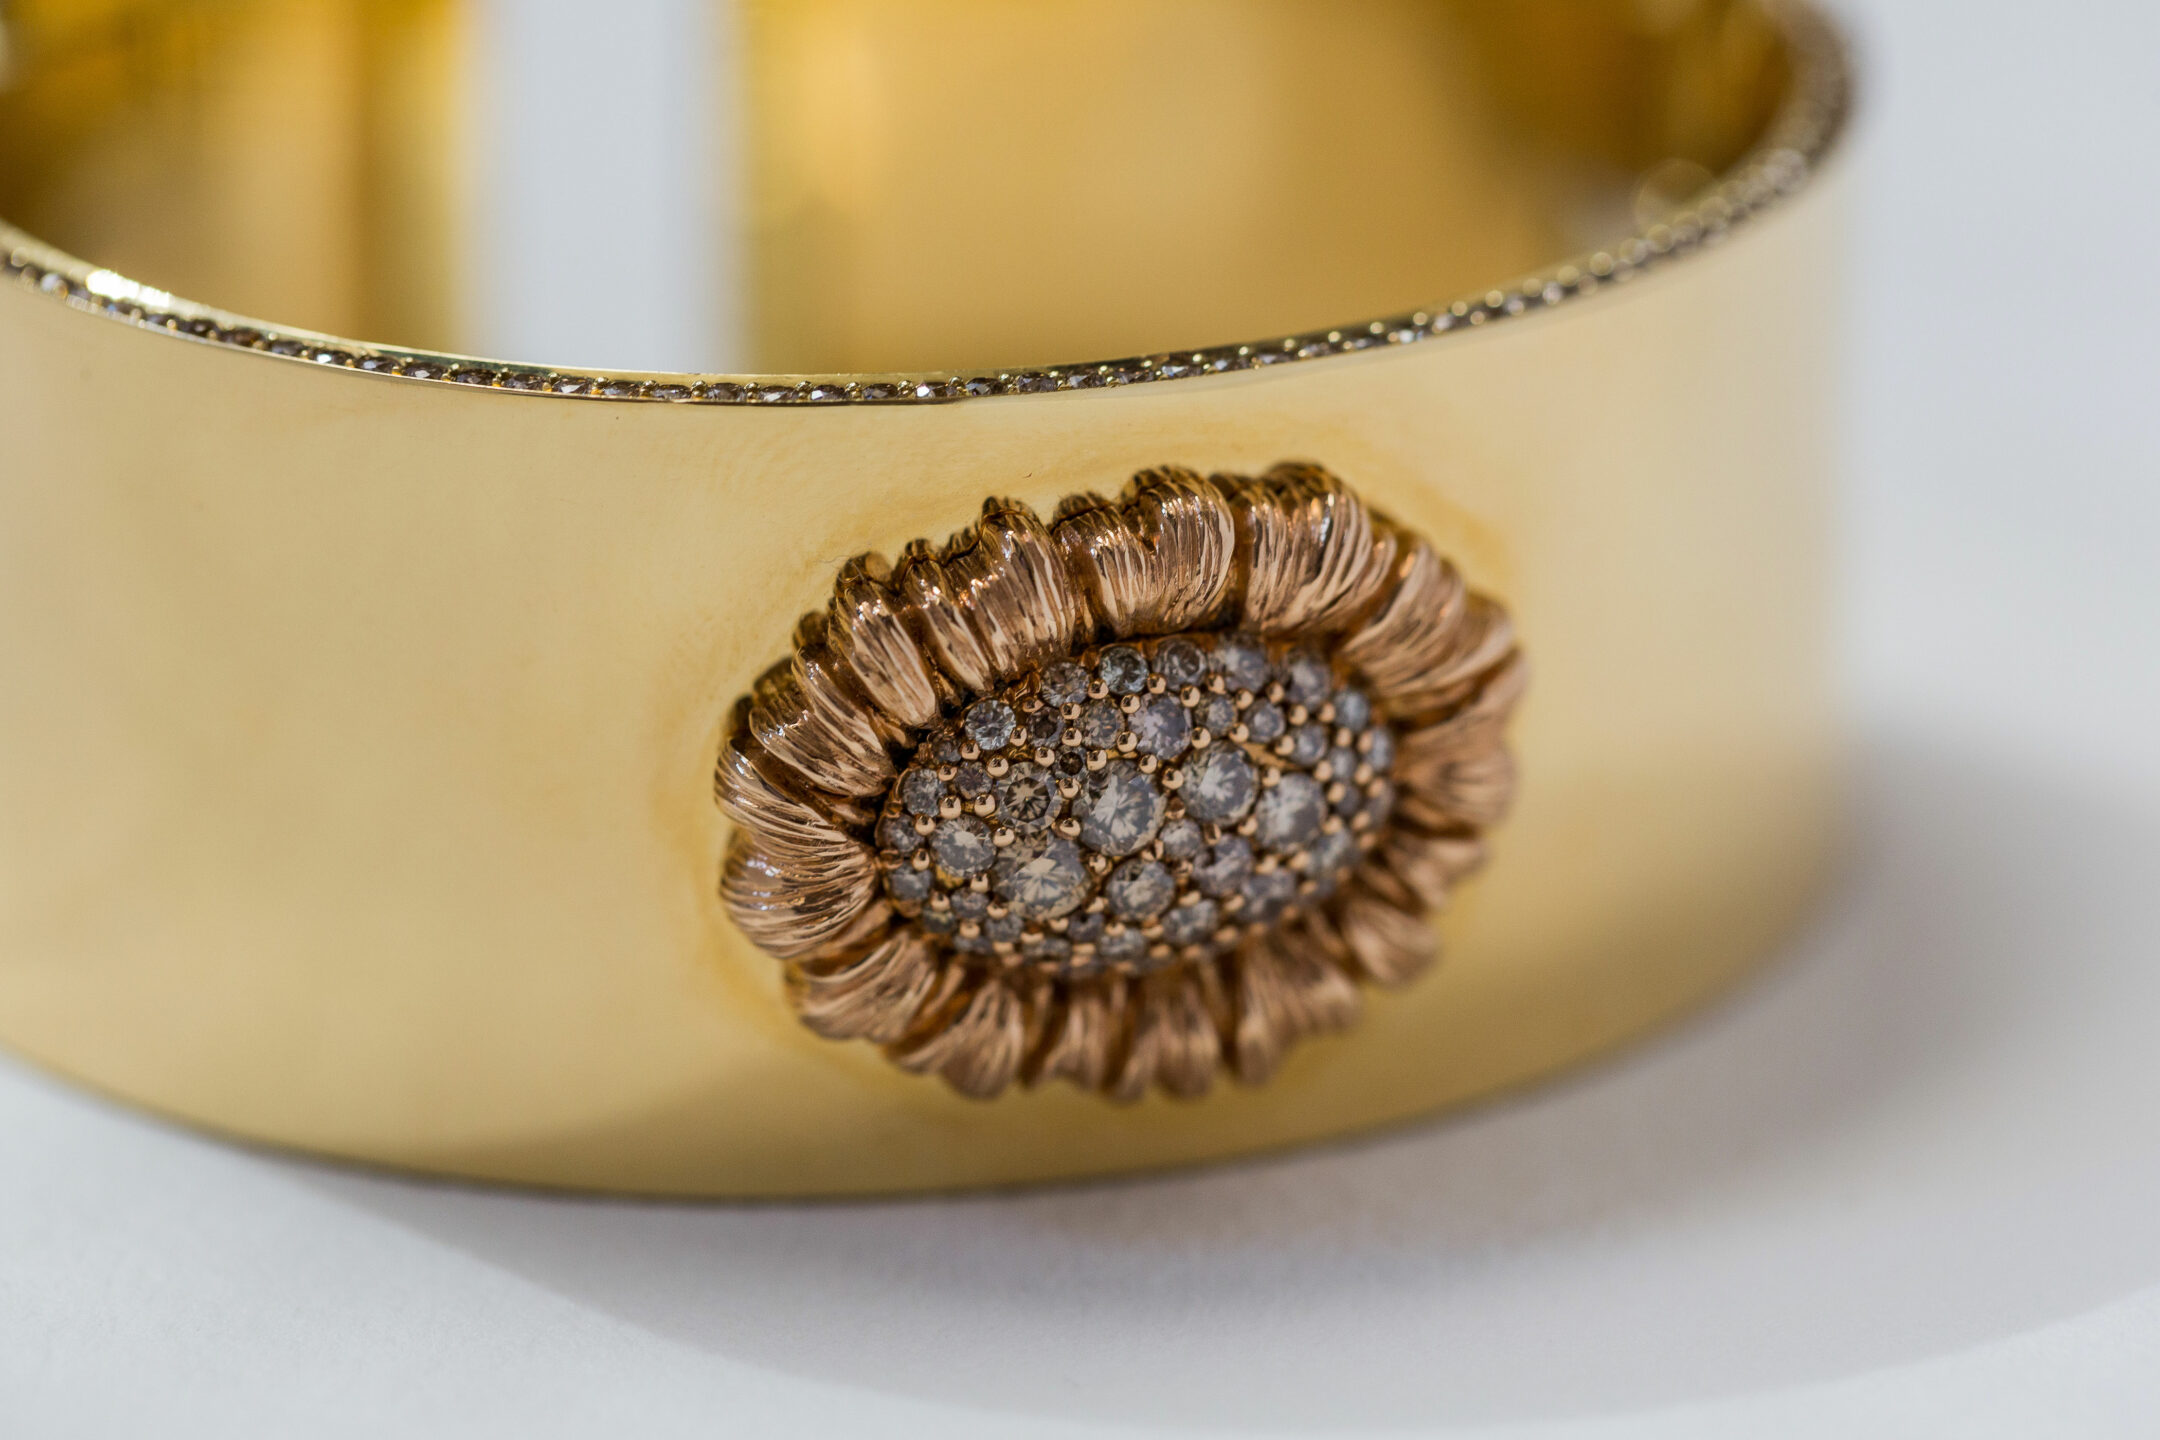 mish_jewelry_product_Nigella-RG-Cuff-Editorial-2